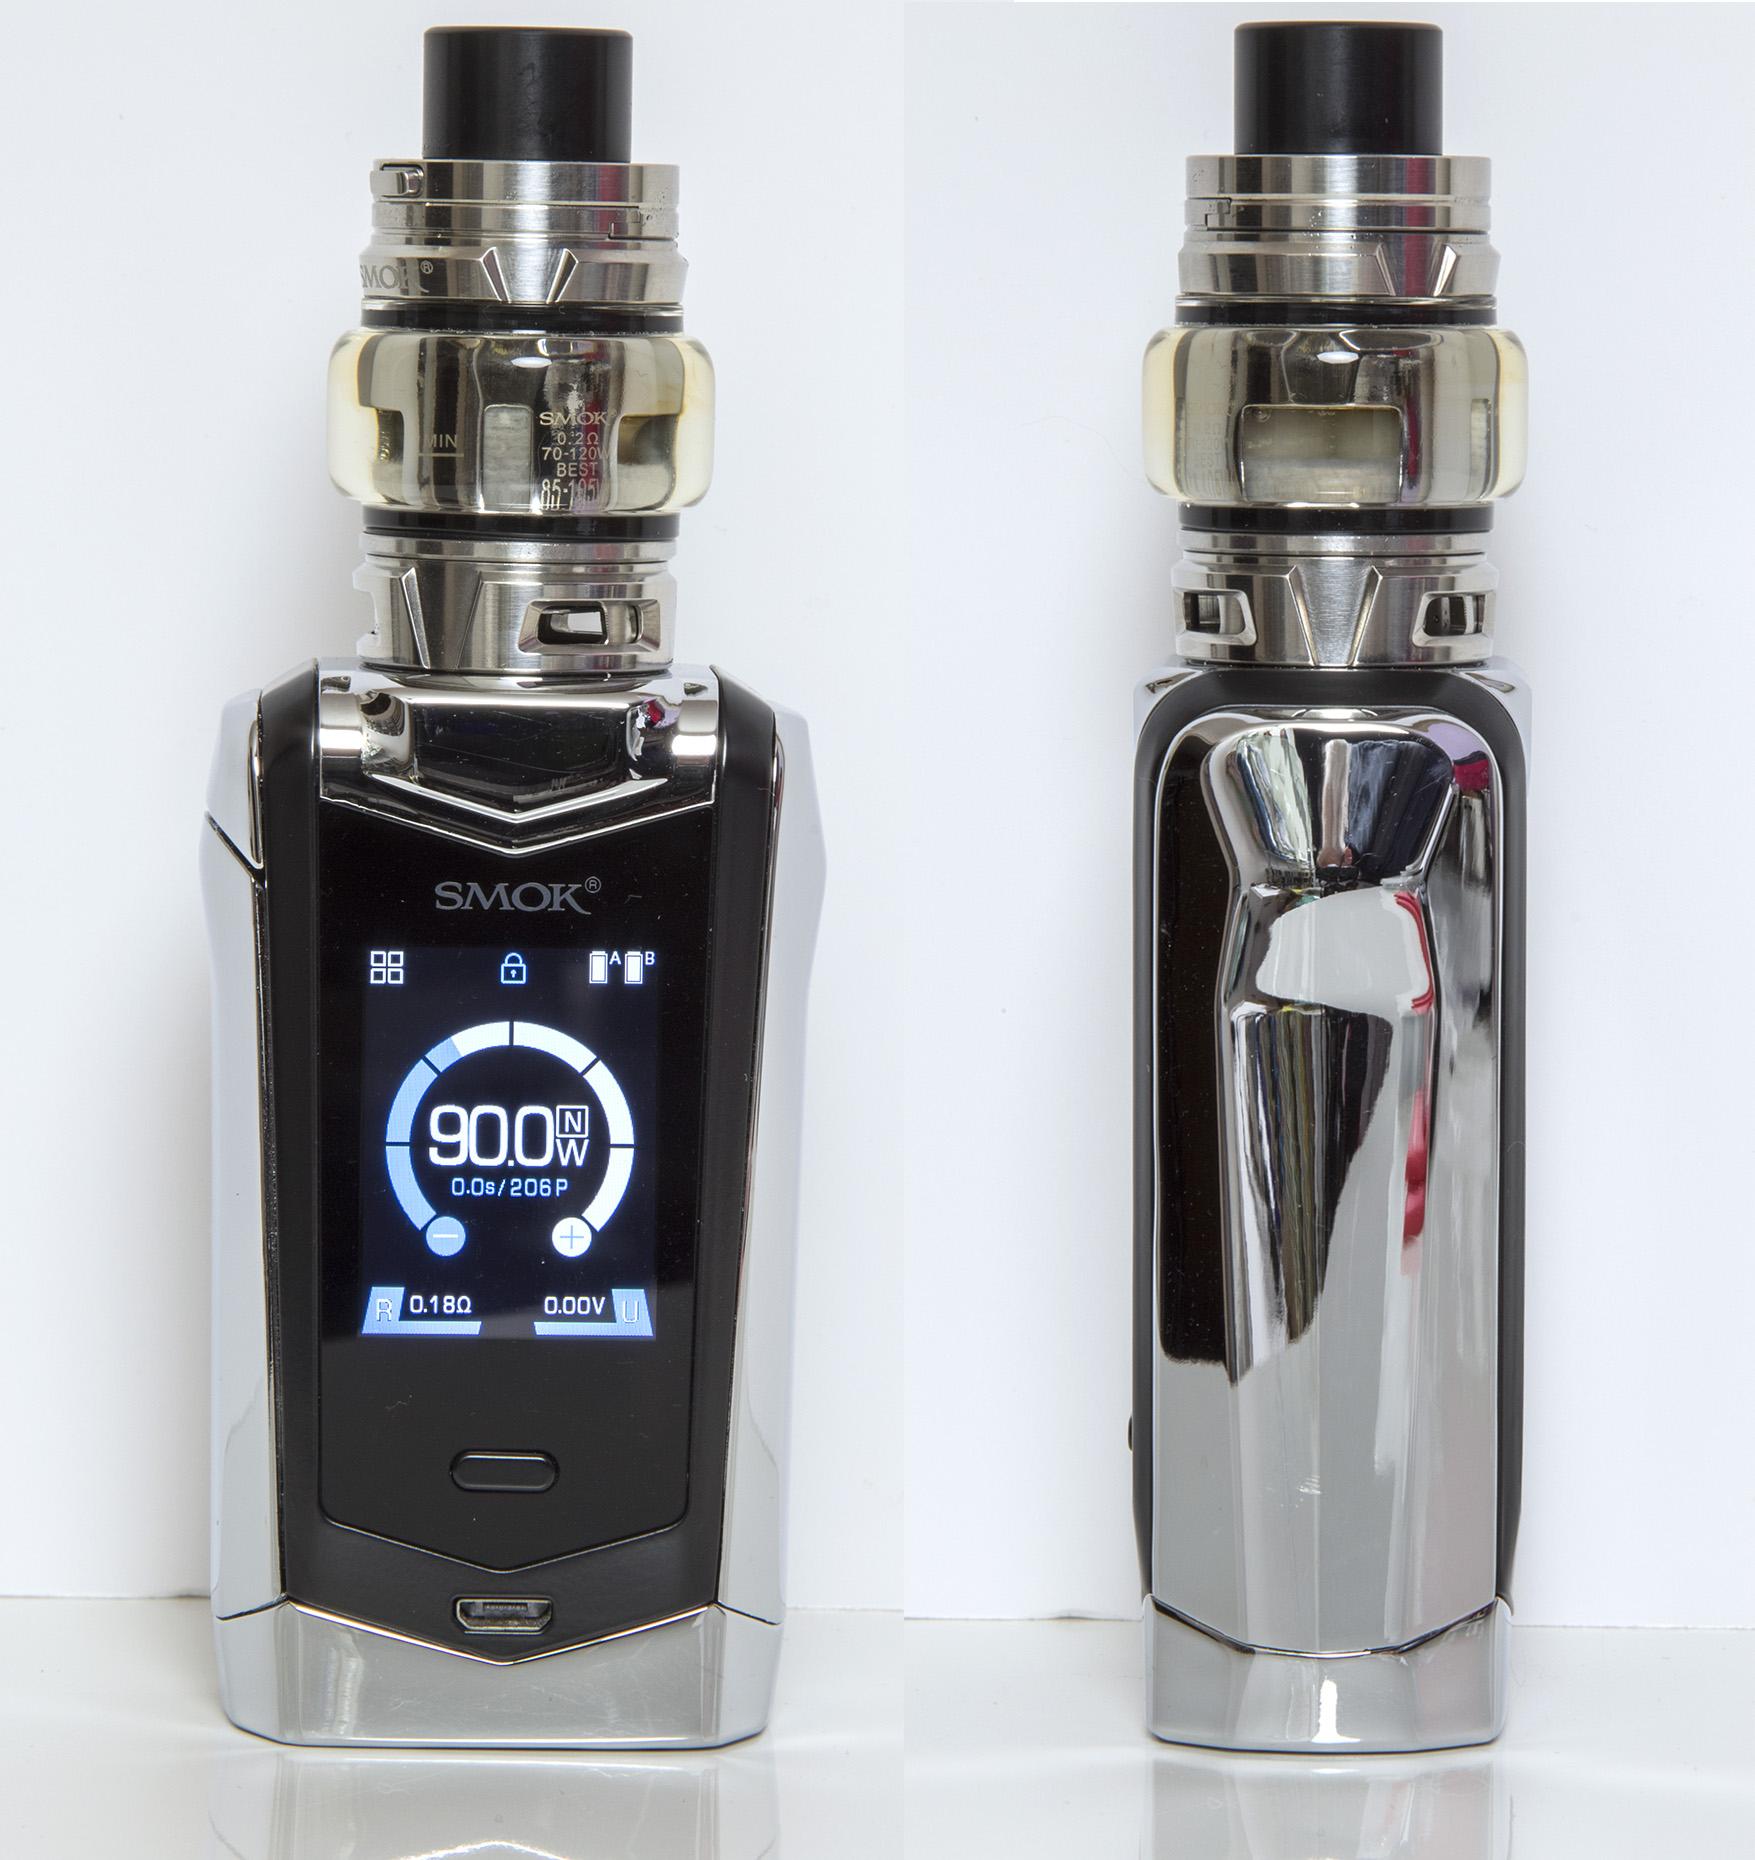 SMOK SPECIES 230W TOUCH SCREEN KIT + Upgrade | Vaping Forum